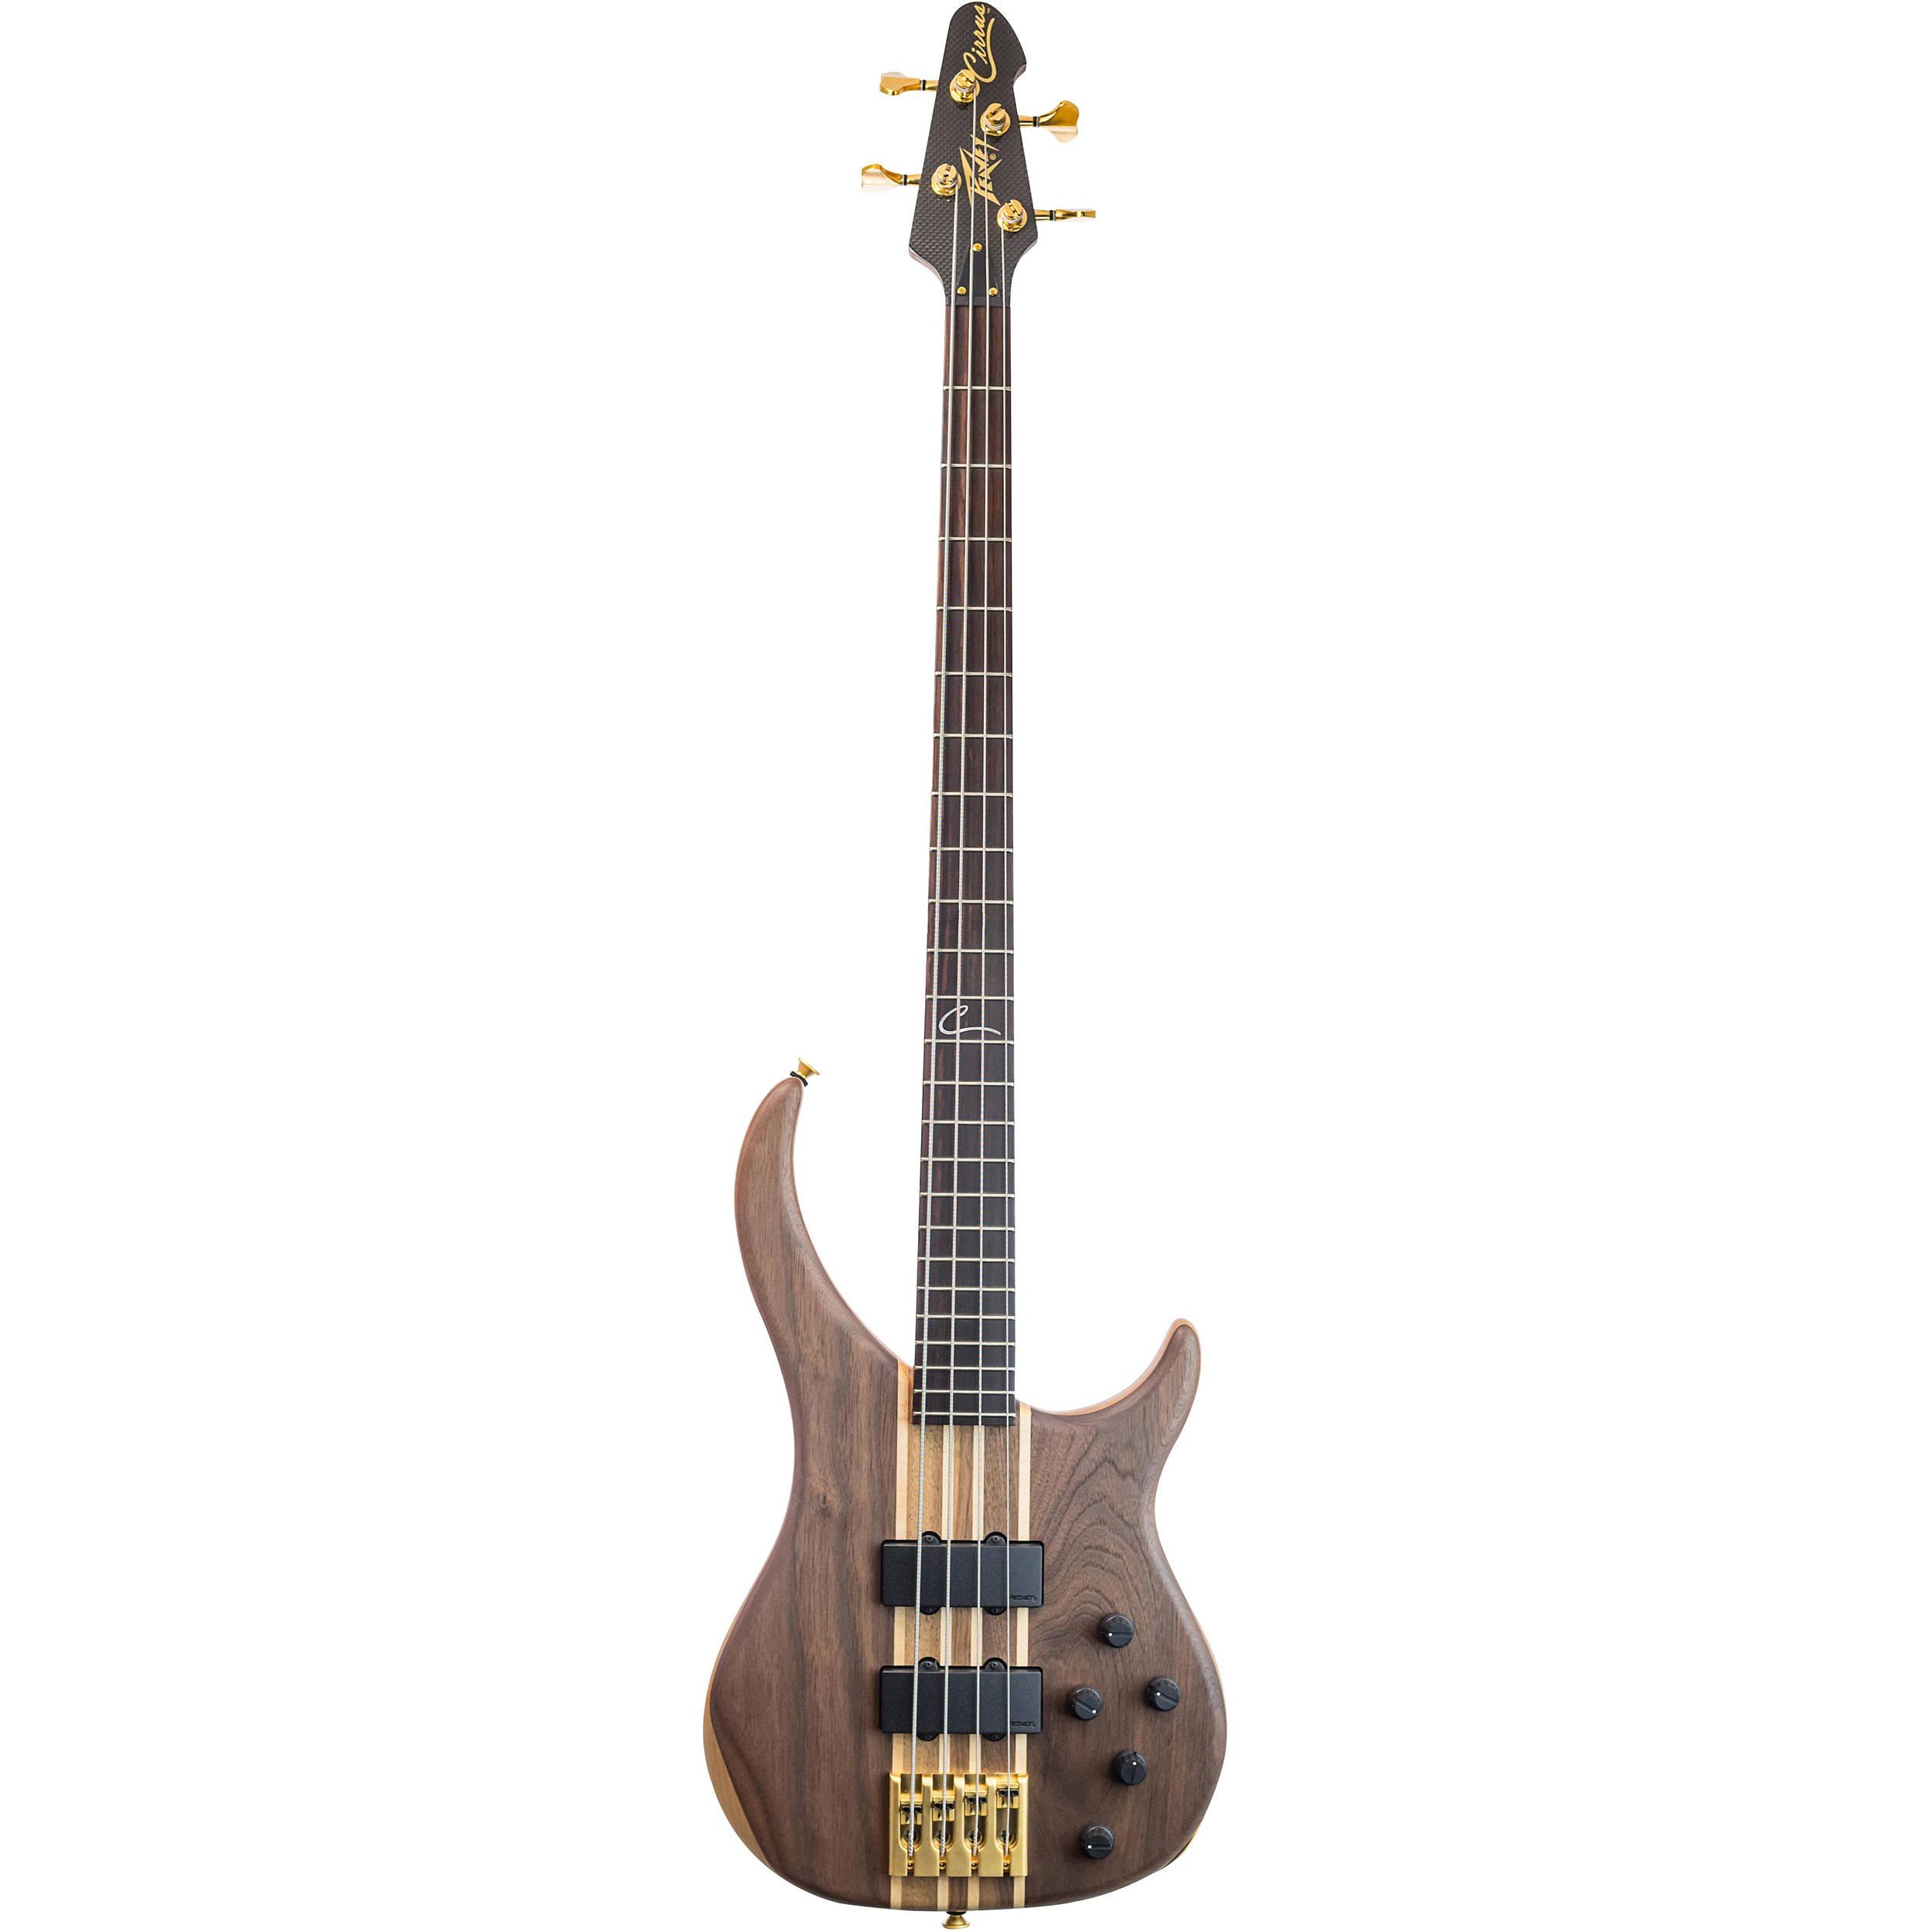 peavey cirrus 4 4 string electric bass guitar walnut 03026750. Black Bedroom Furniture Sets. Home Design Ideas